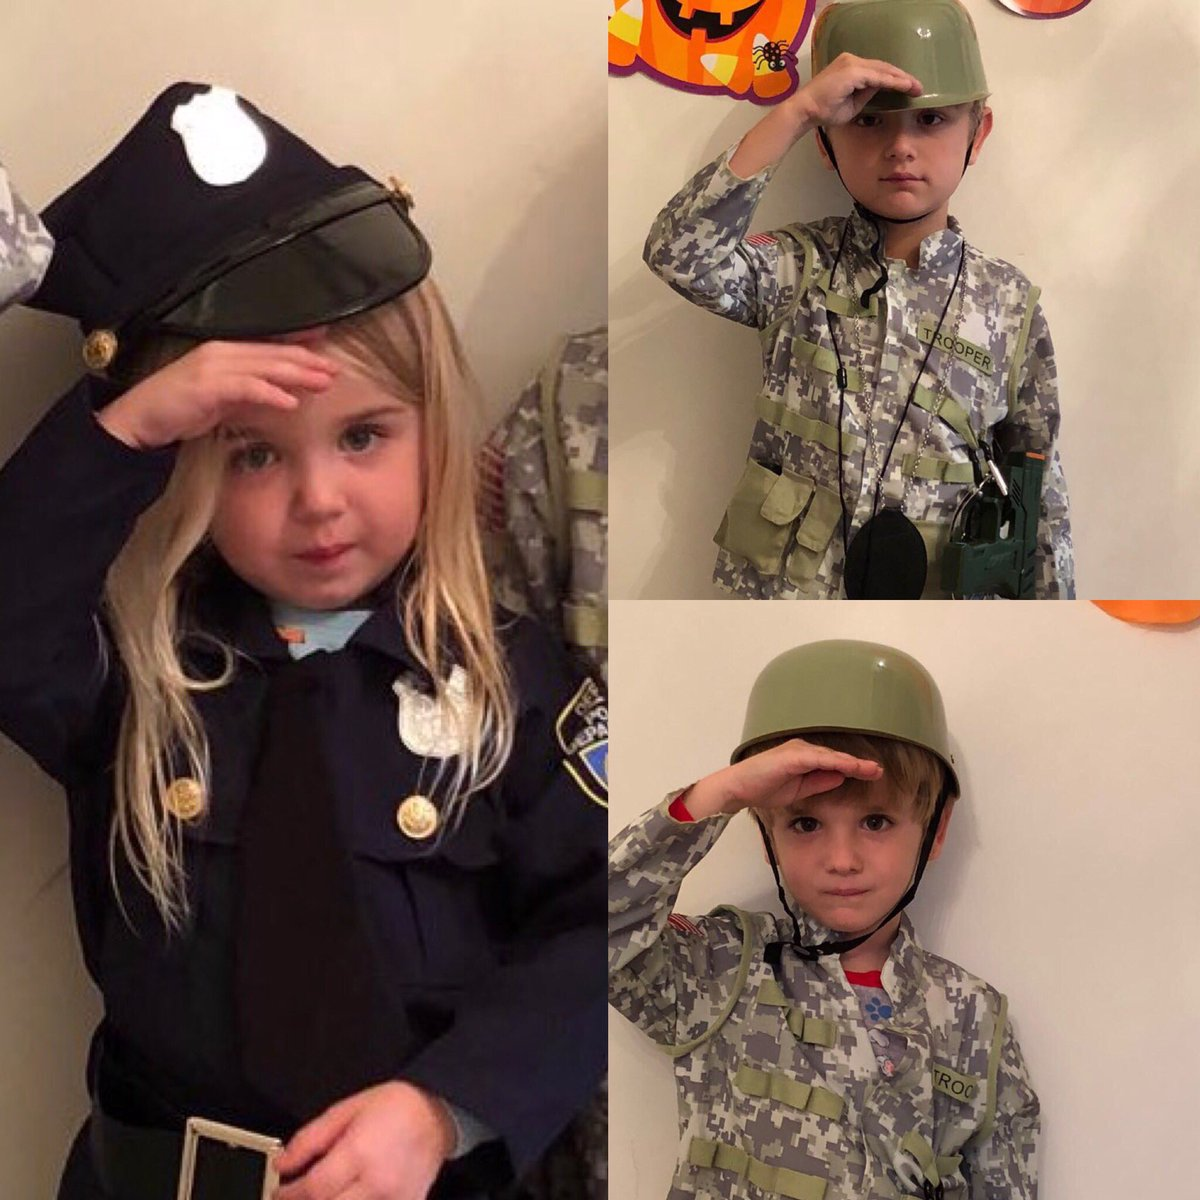 Pres. Trump's grandchildren show off military, law enforcement Halloween costumes